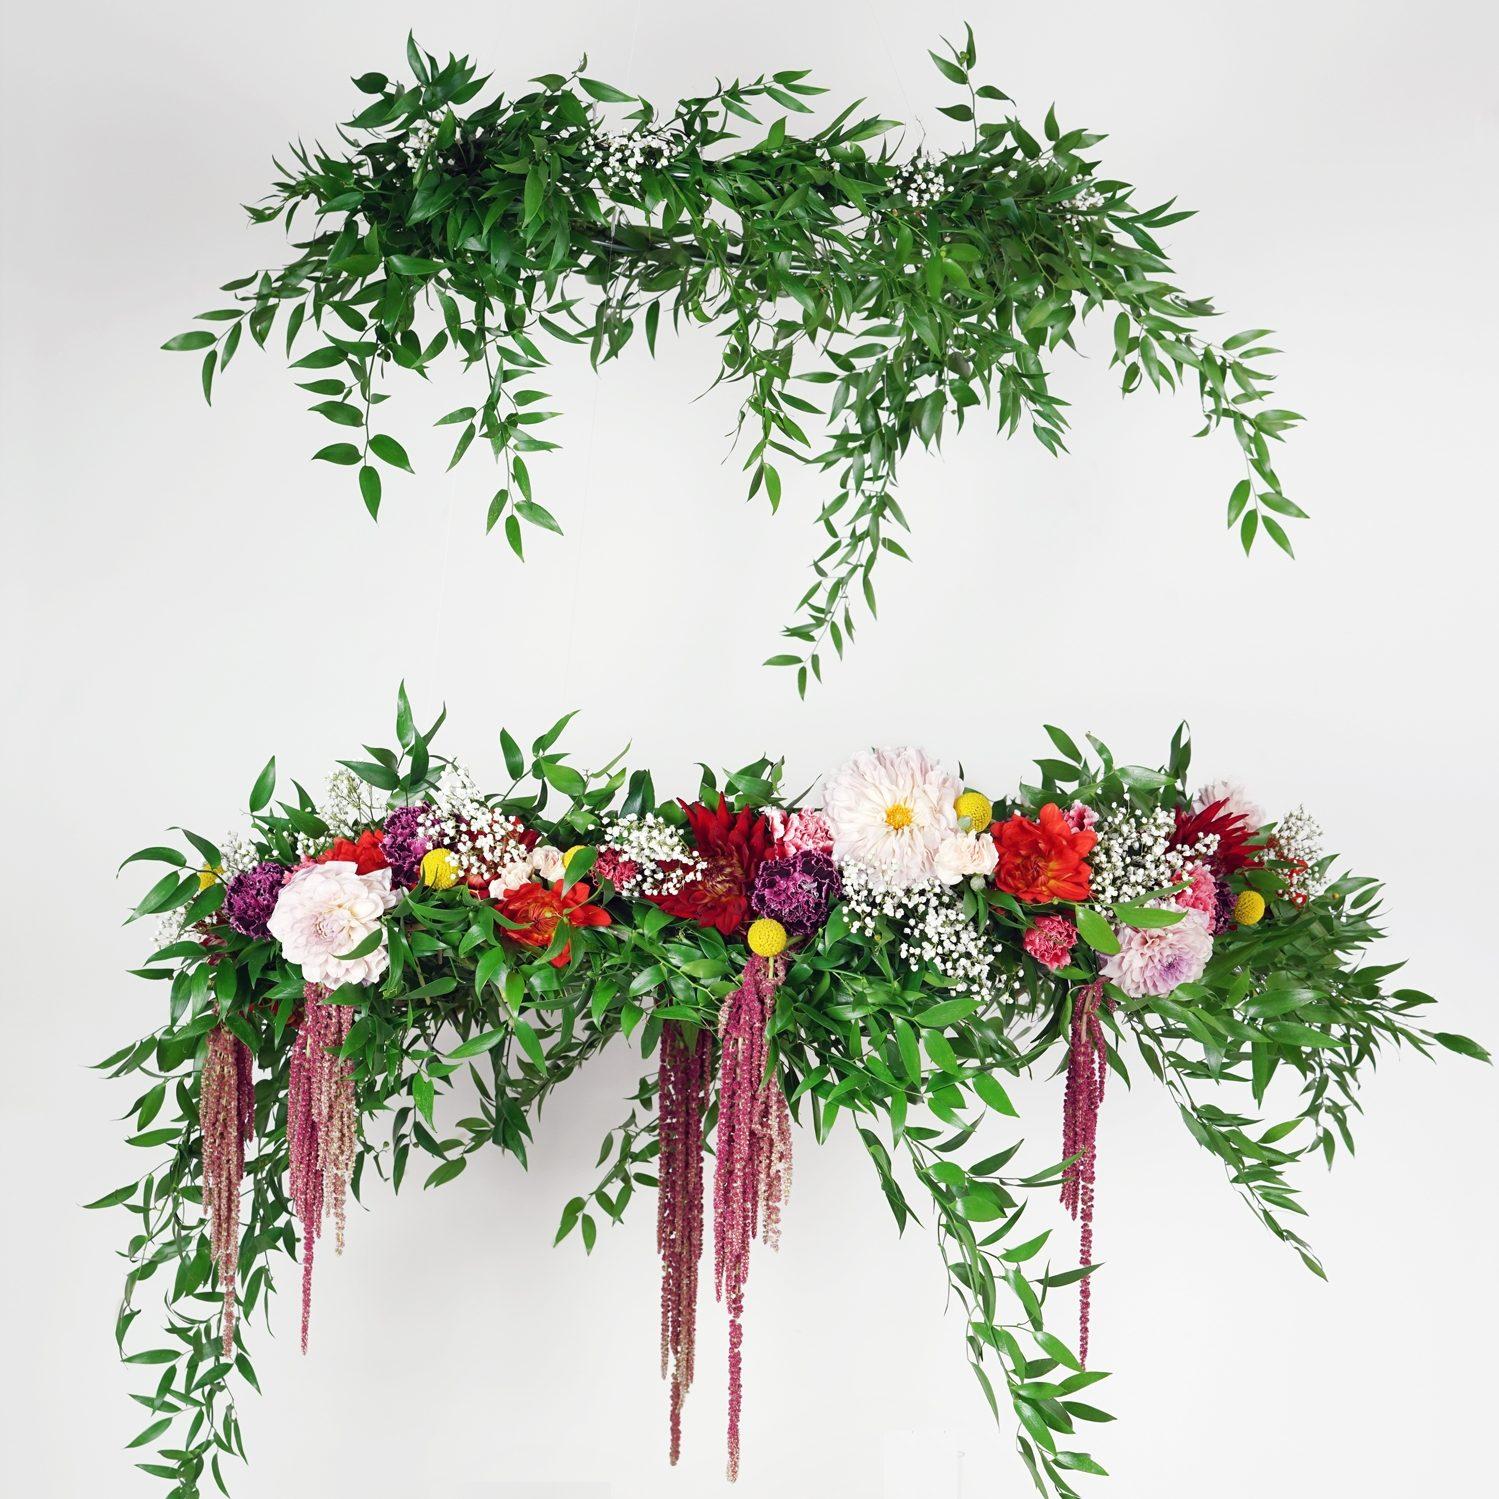 https://chicvintagebrides.com/wp-content/uploads/2018/11/flower-chandelier-e1541729069151.jpg